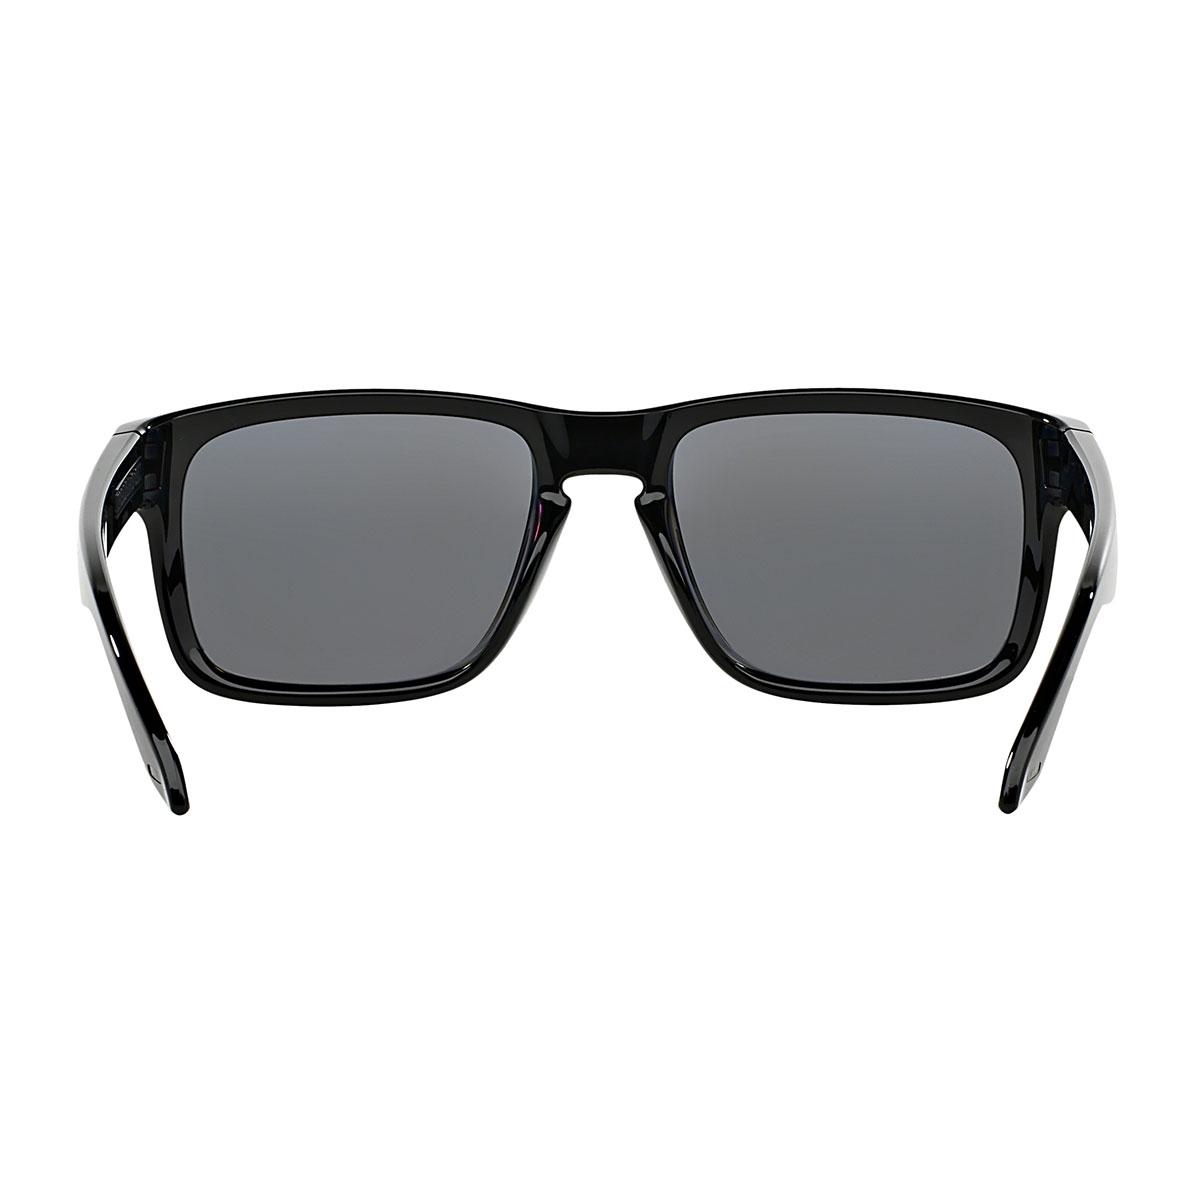 a80c4aa2fd466 ... Image of Oakley Holbrook Sunglasses - Polished Black Frame Grey  Polarized Lens ...